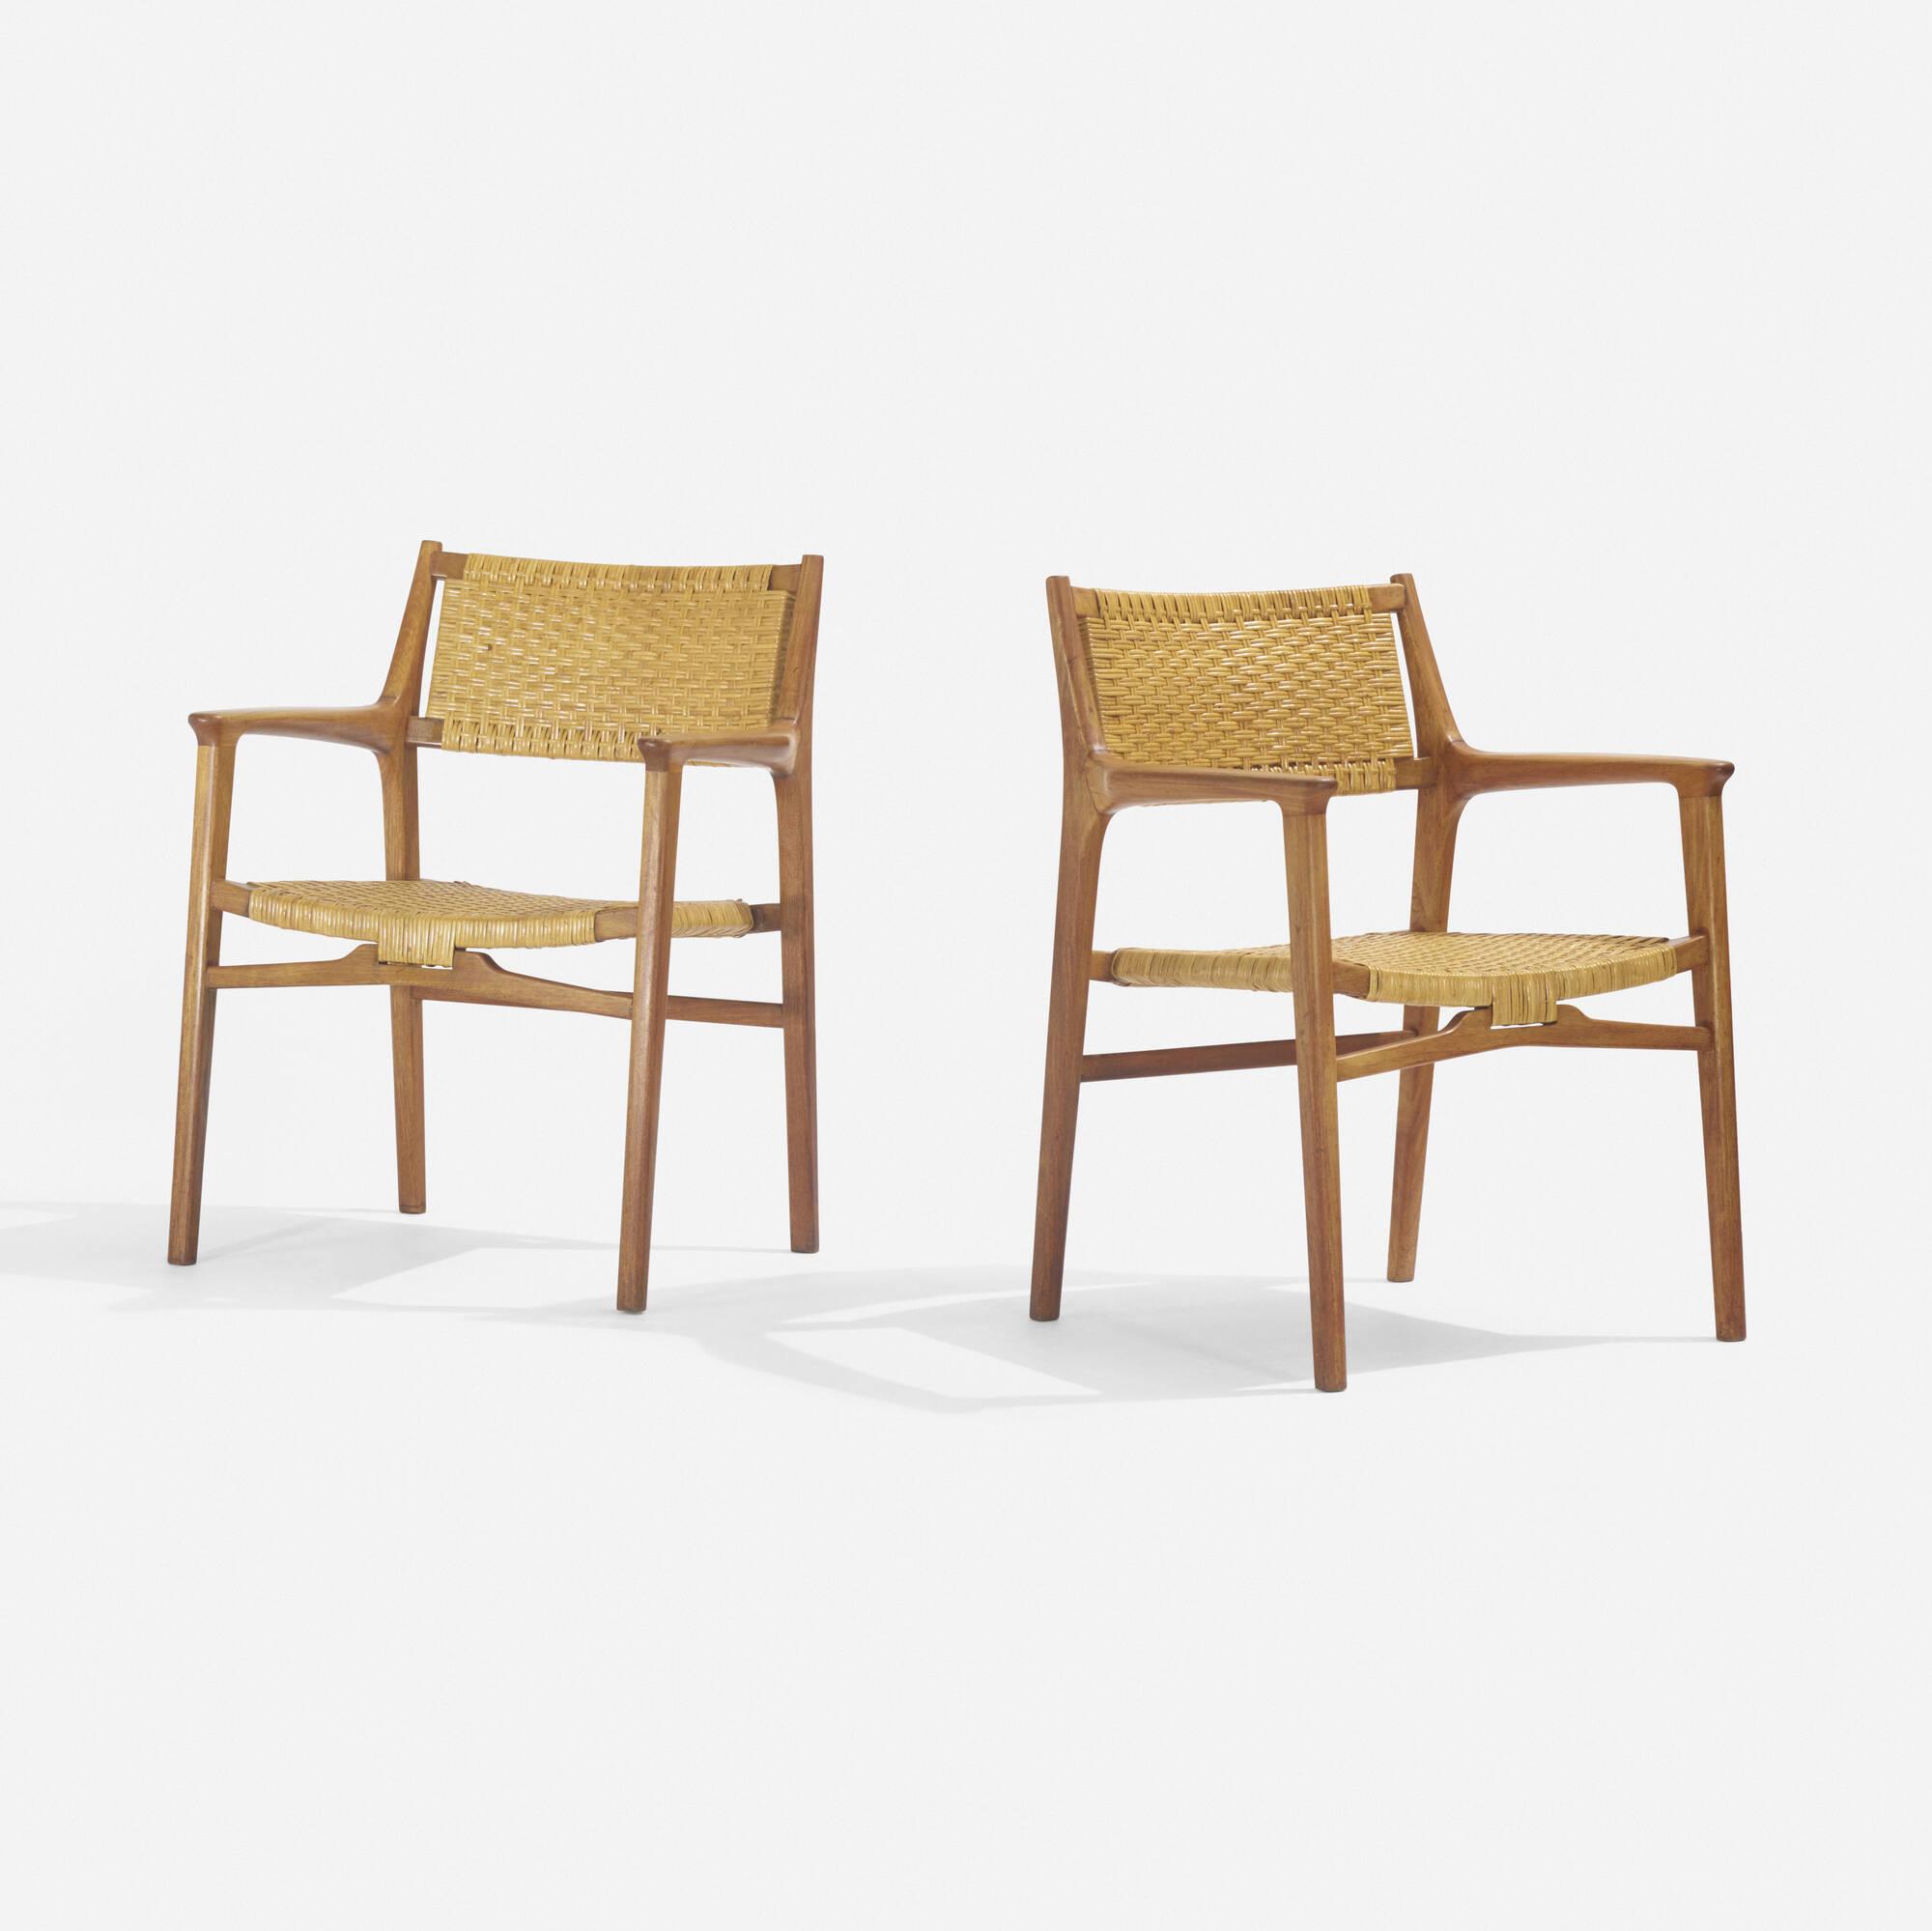 233: Hans J. Wegner / rare lounge chairs, pair (1 of 3)